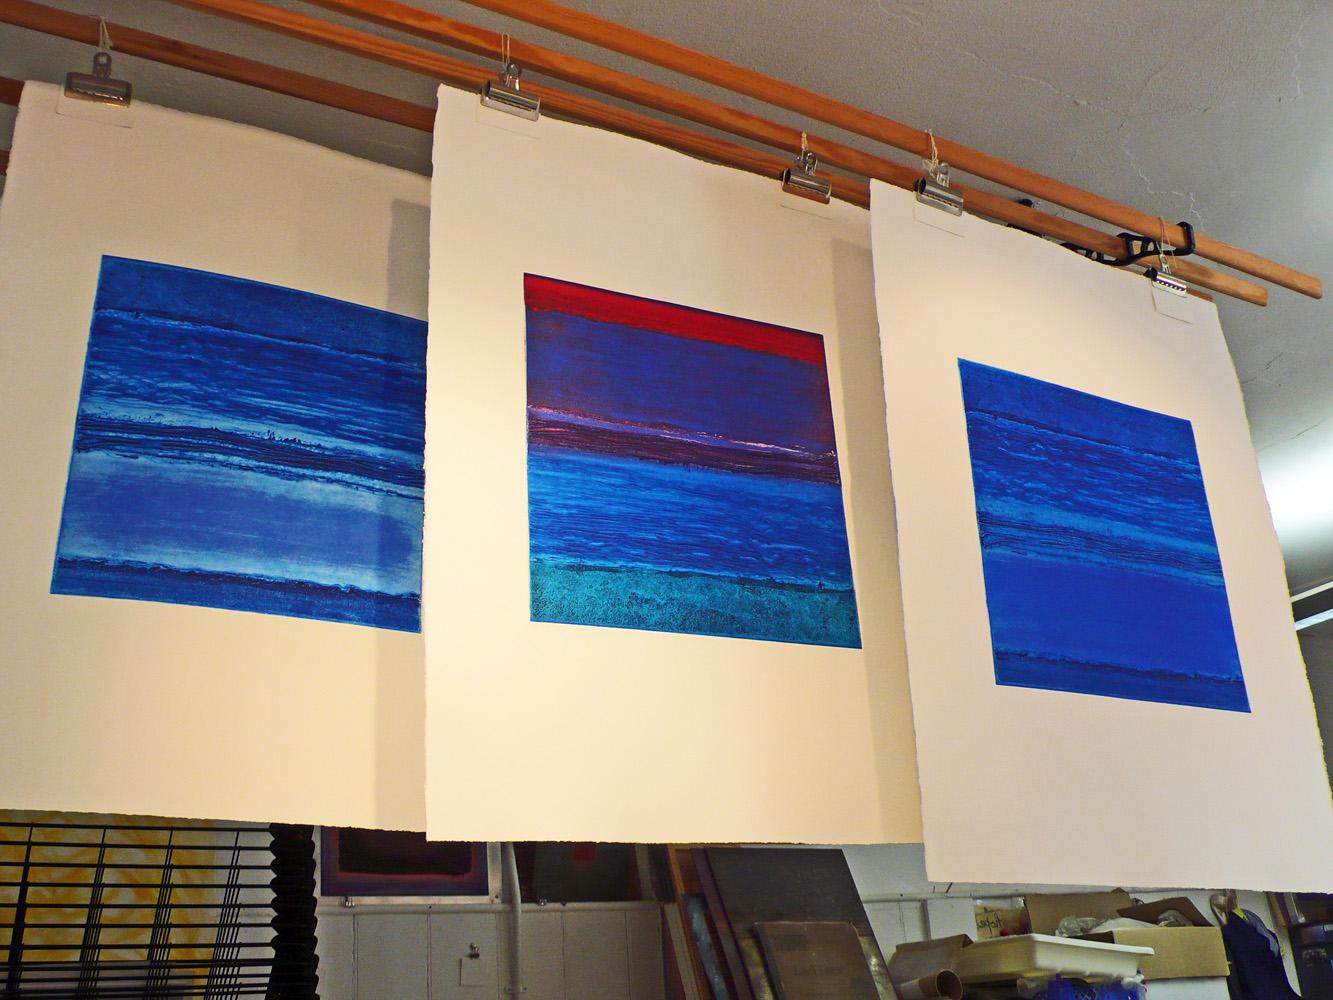 Land-sea-sky-carborundum-prints-Deborah-Treliving-contemporary-British-artist